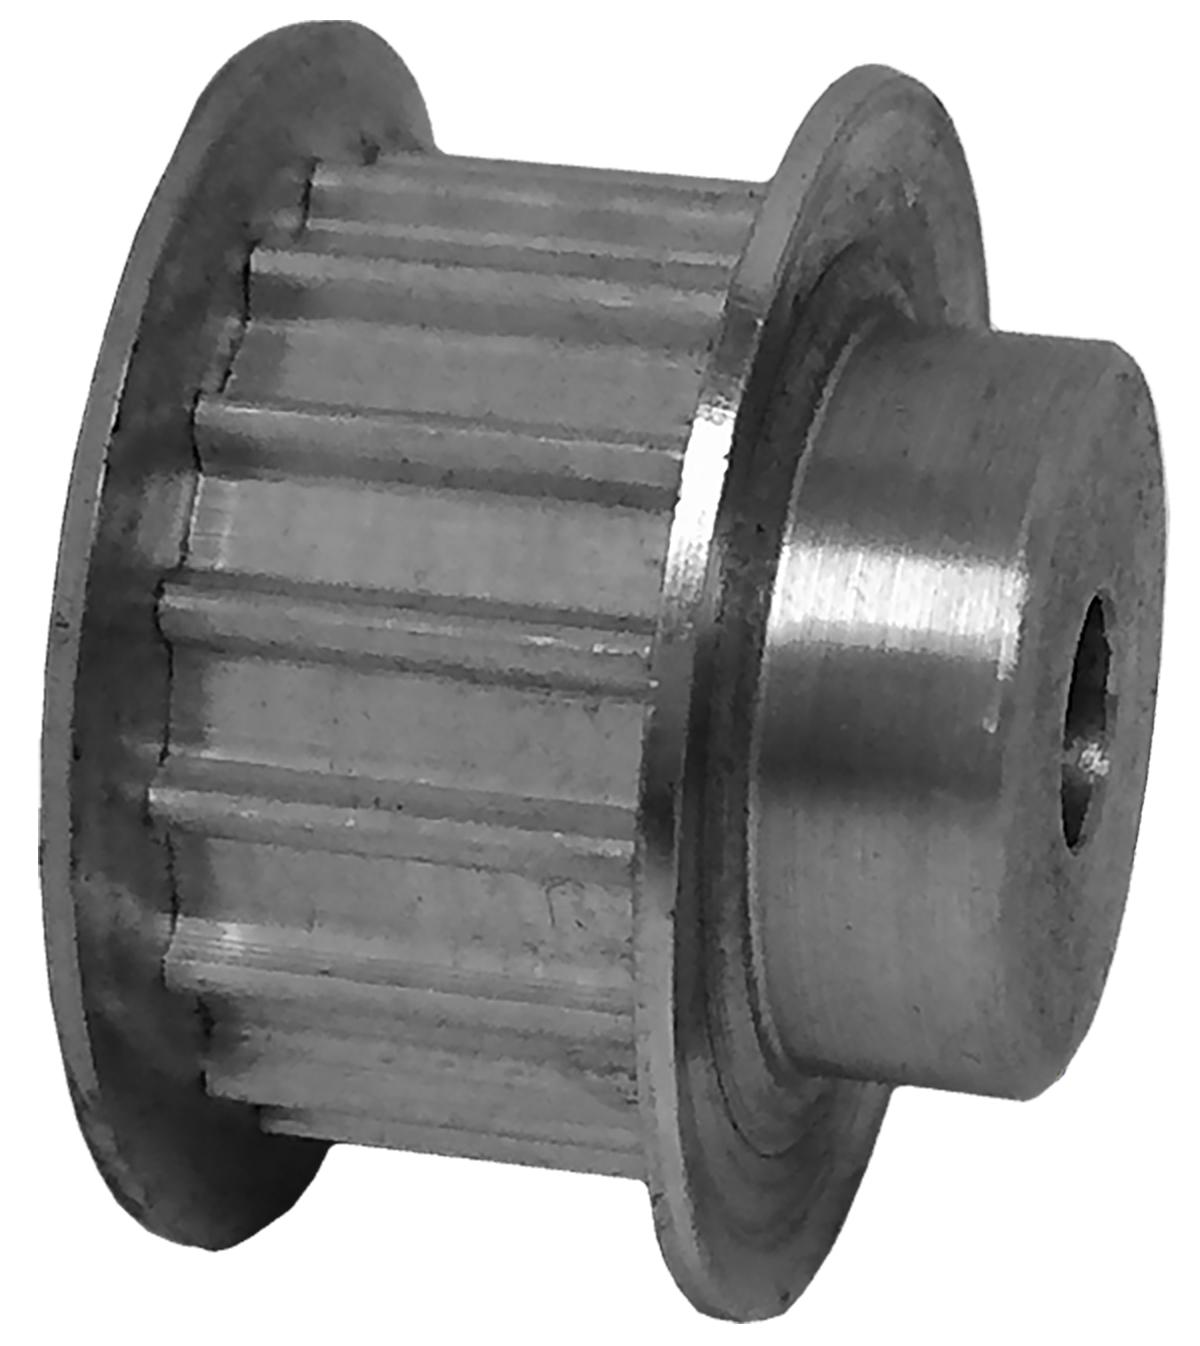 21AT5/16-2 - Aluminum Metric Pulleys